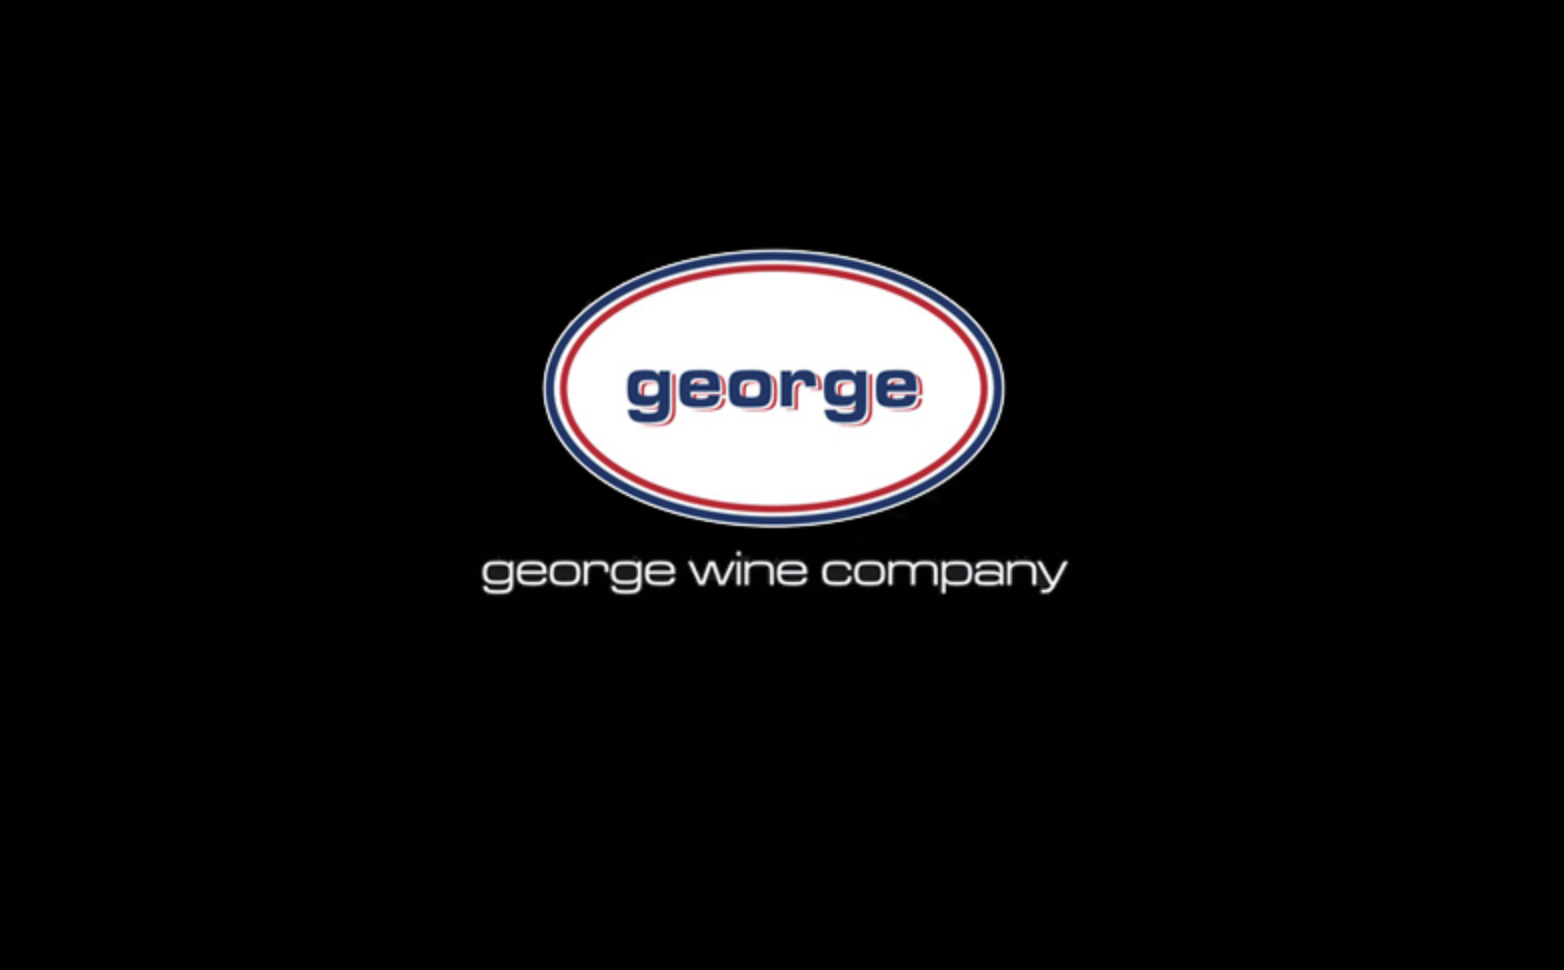 george-big logo.png